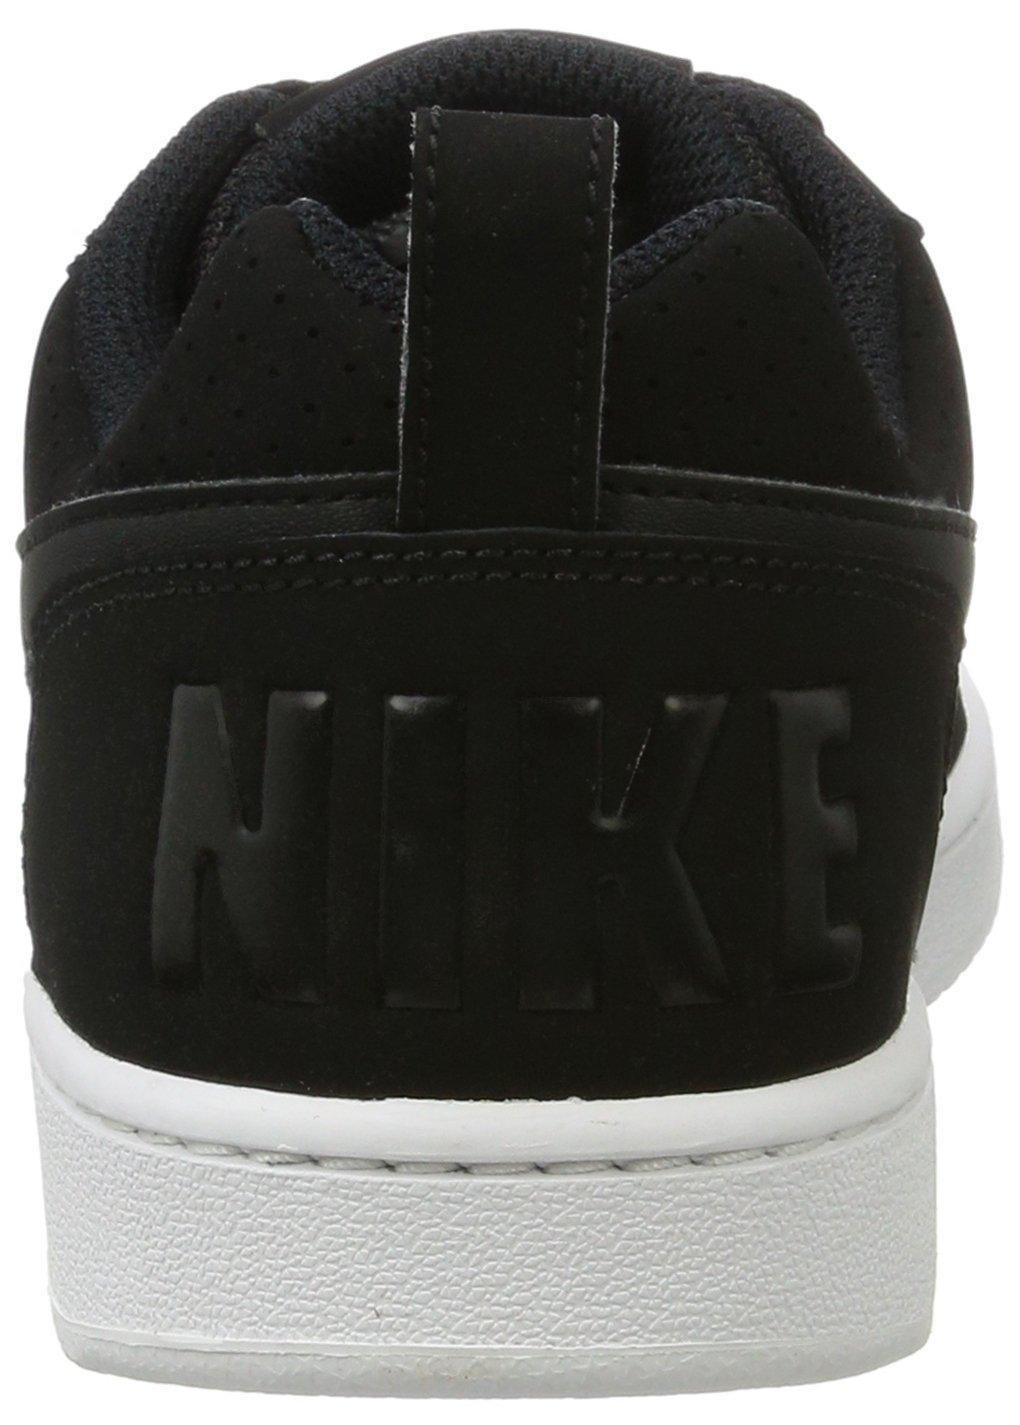 Nike Damen Wmns Court Borough (Noir/Blanc/Noir) Niedrig Basketballschuhe Schwarz (Noir/Blanc/Noir) Borough f57529